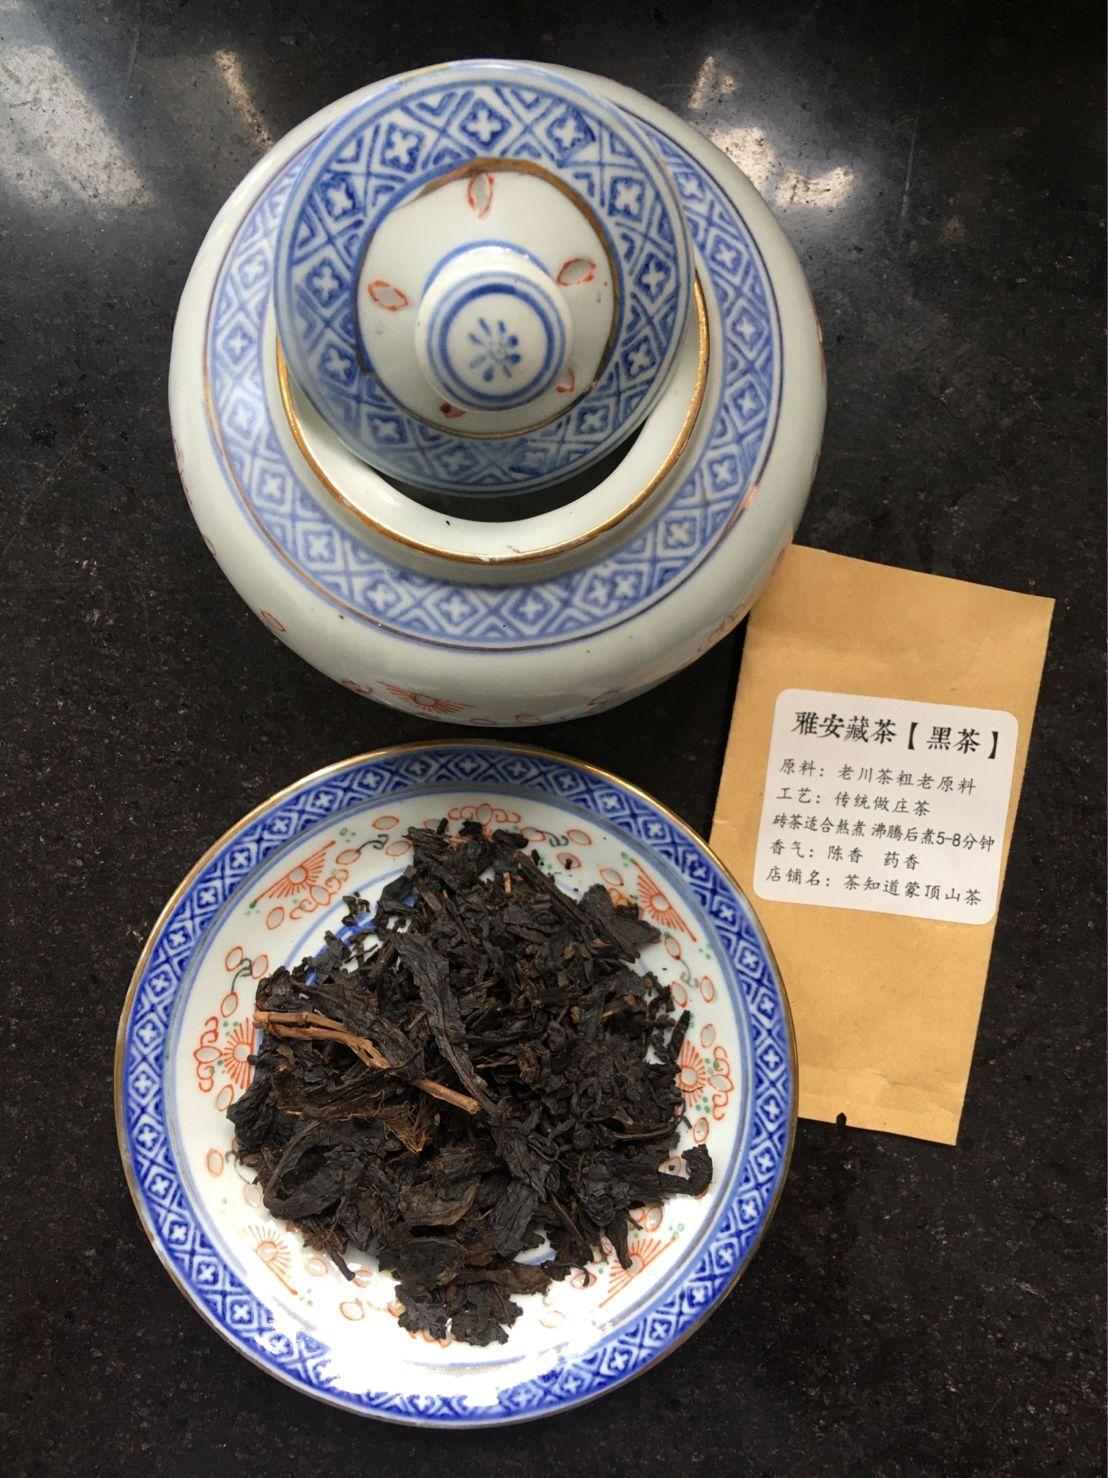 Yǎ Ān Cáng Chá 【Hēi Chá】雅安藏茶【黑茶】Ya'an Tibetan Black Tea